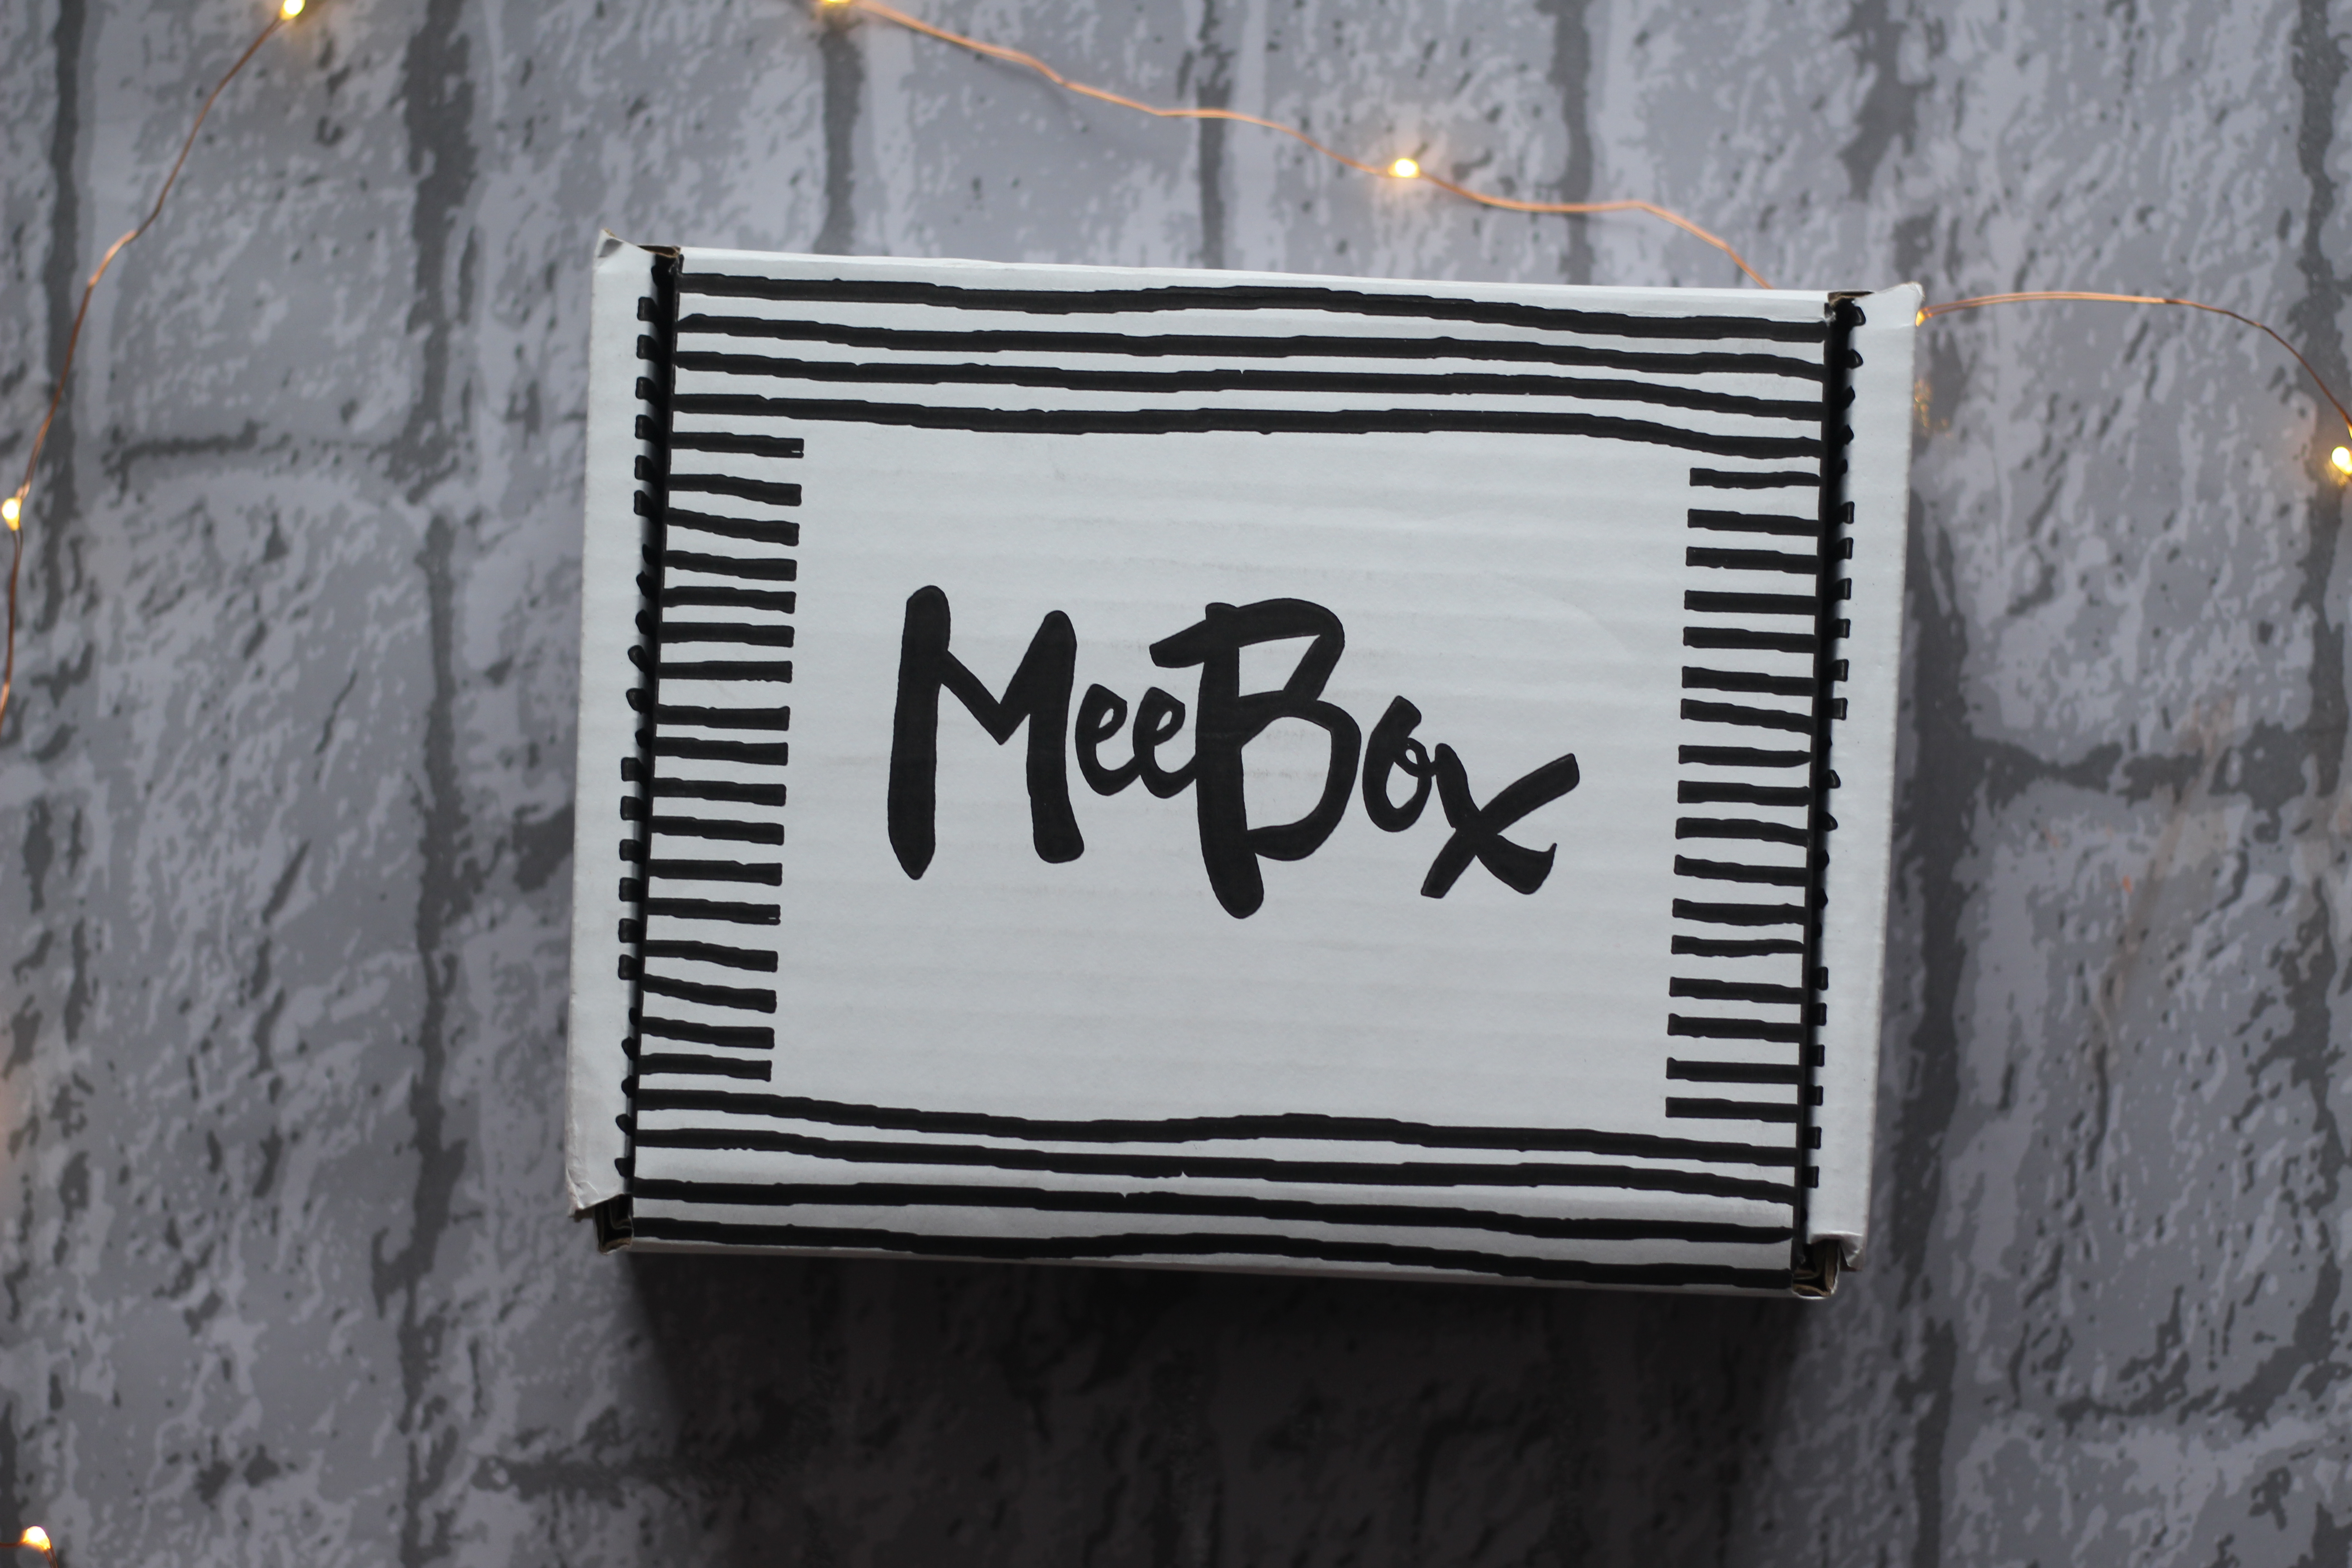 Meebox